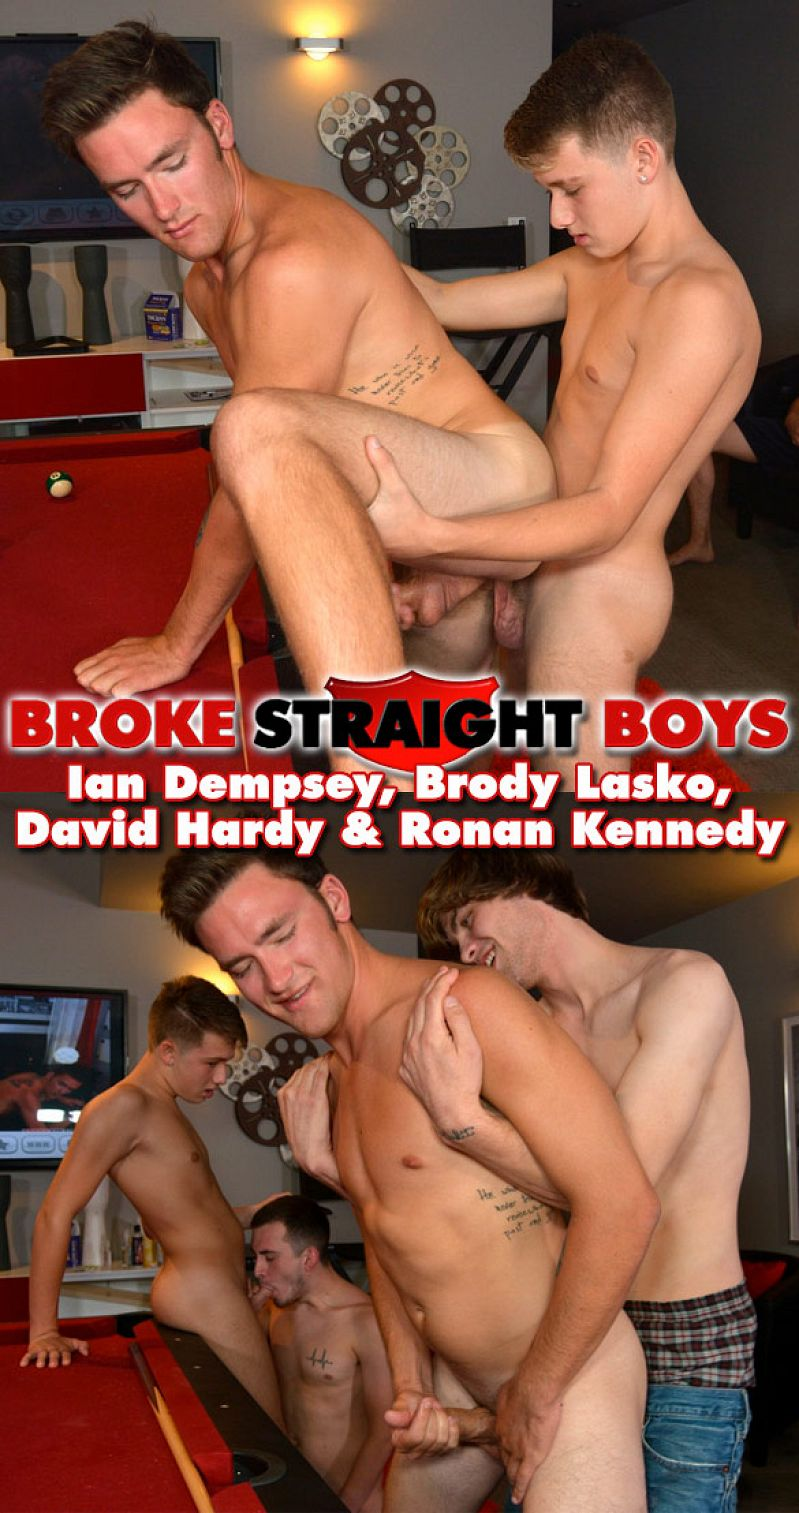 Brody Lasko, Ian Dempsey, David Hardy & Ronan Kennedy's orgy